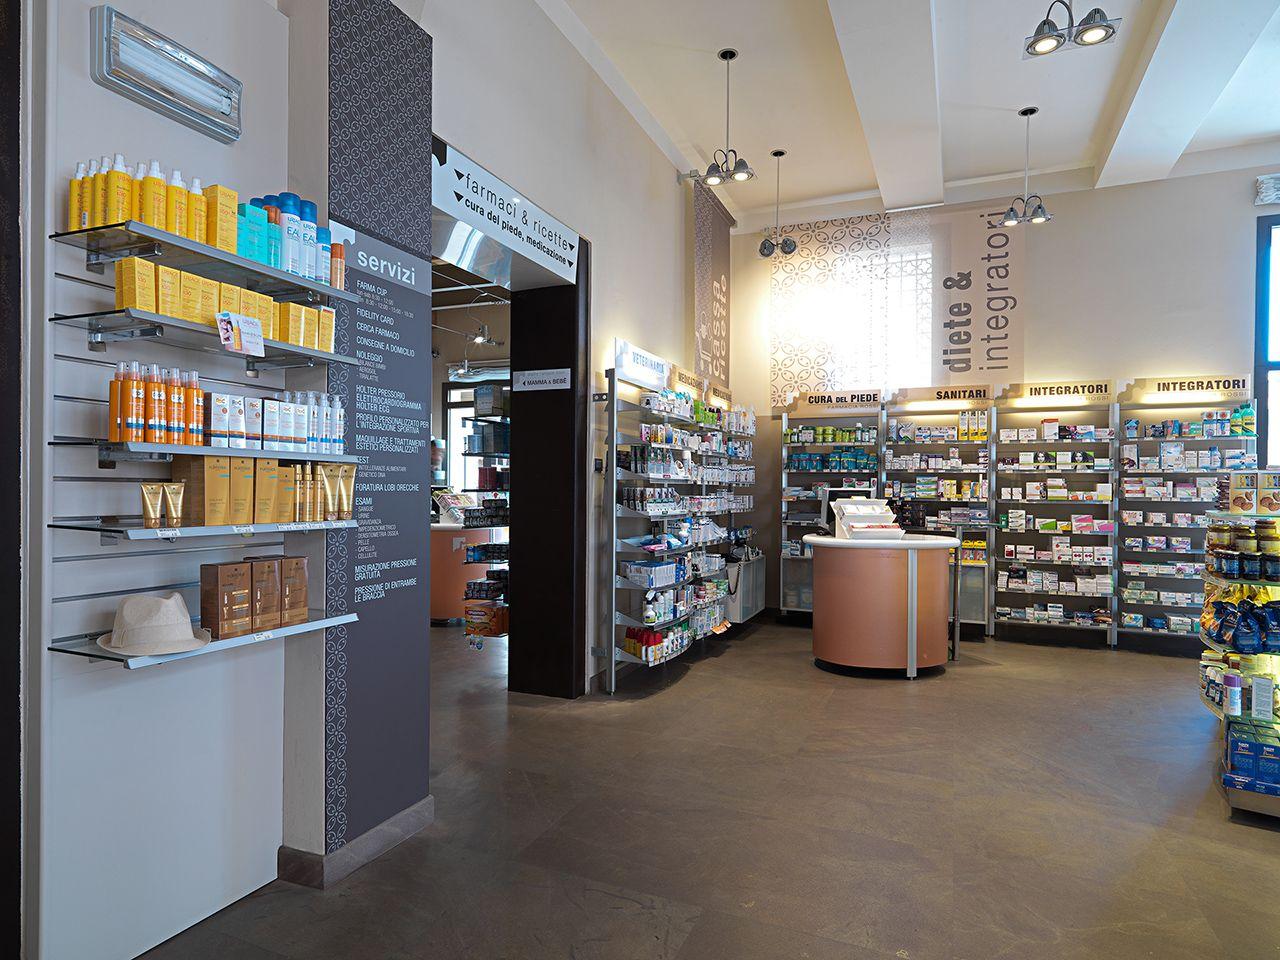 La Cabina Estetica In Farmacia : Farmacia de bella dr marco estetista in farmacia